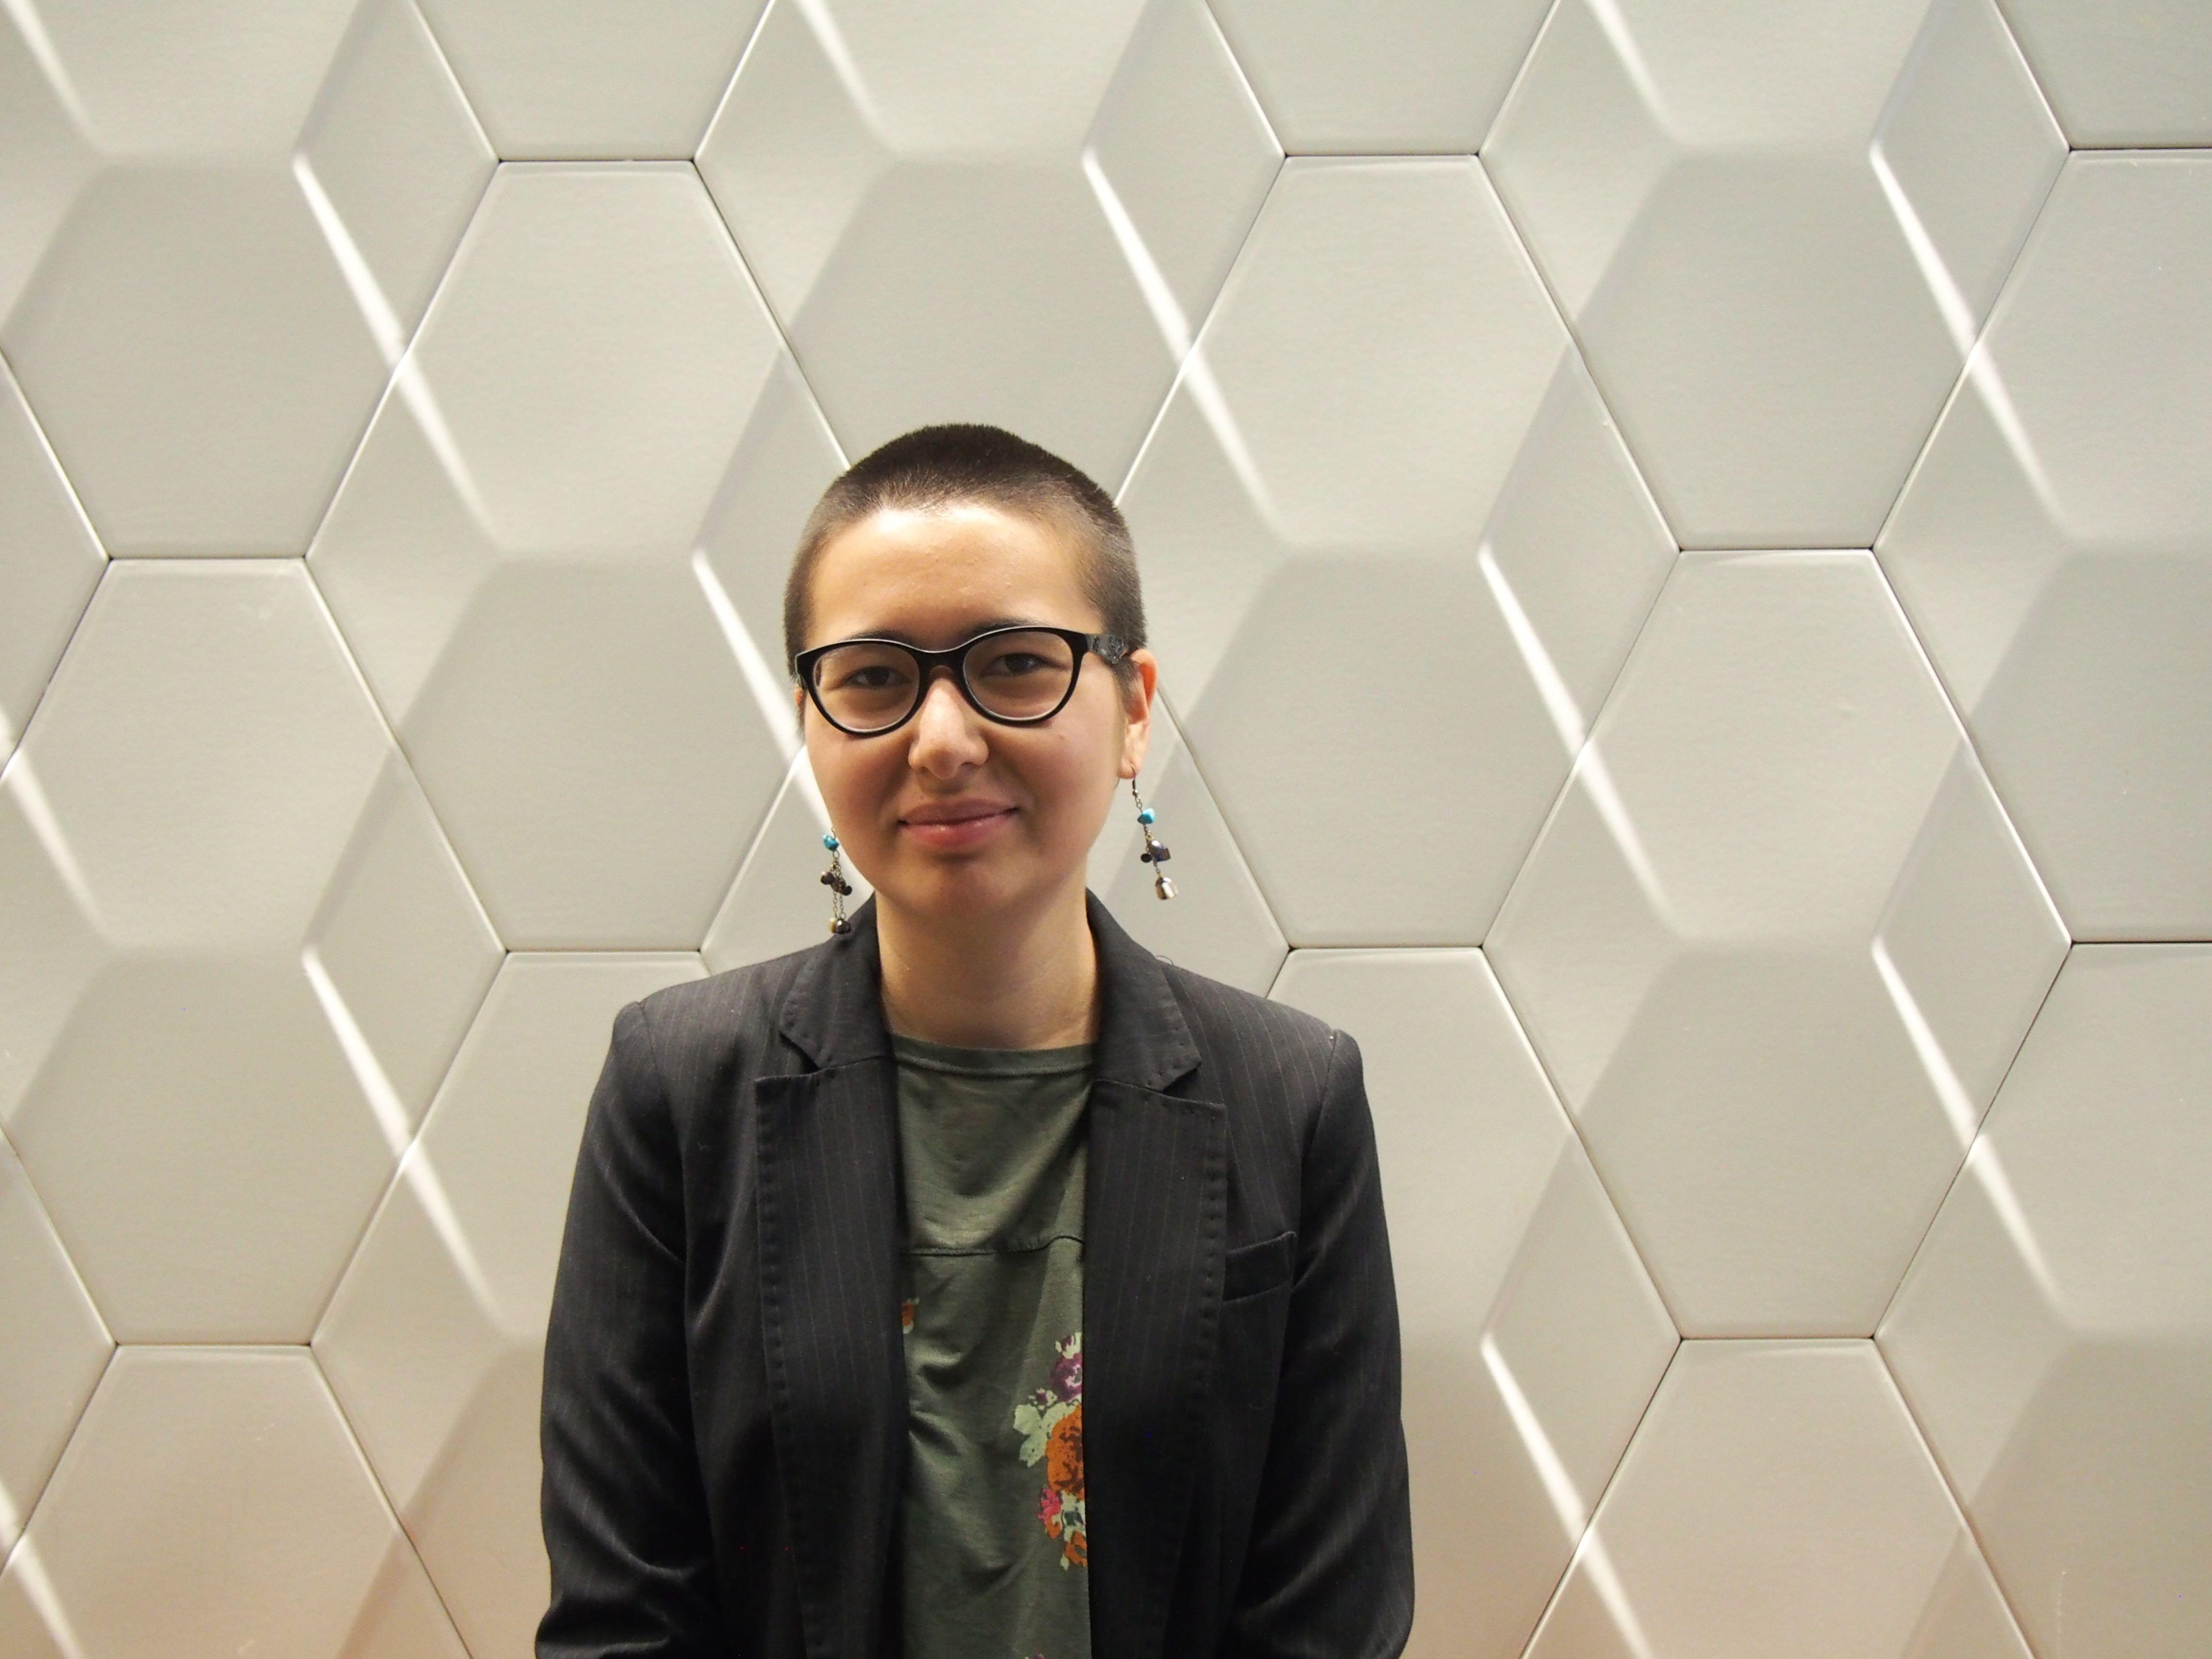 Yumi Dineen Shiroma